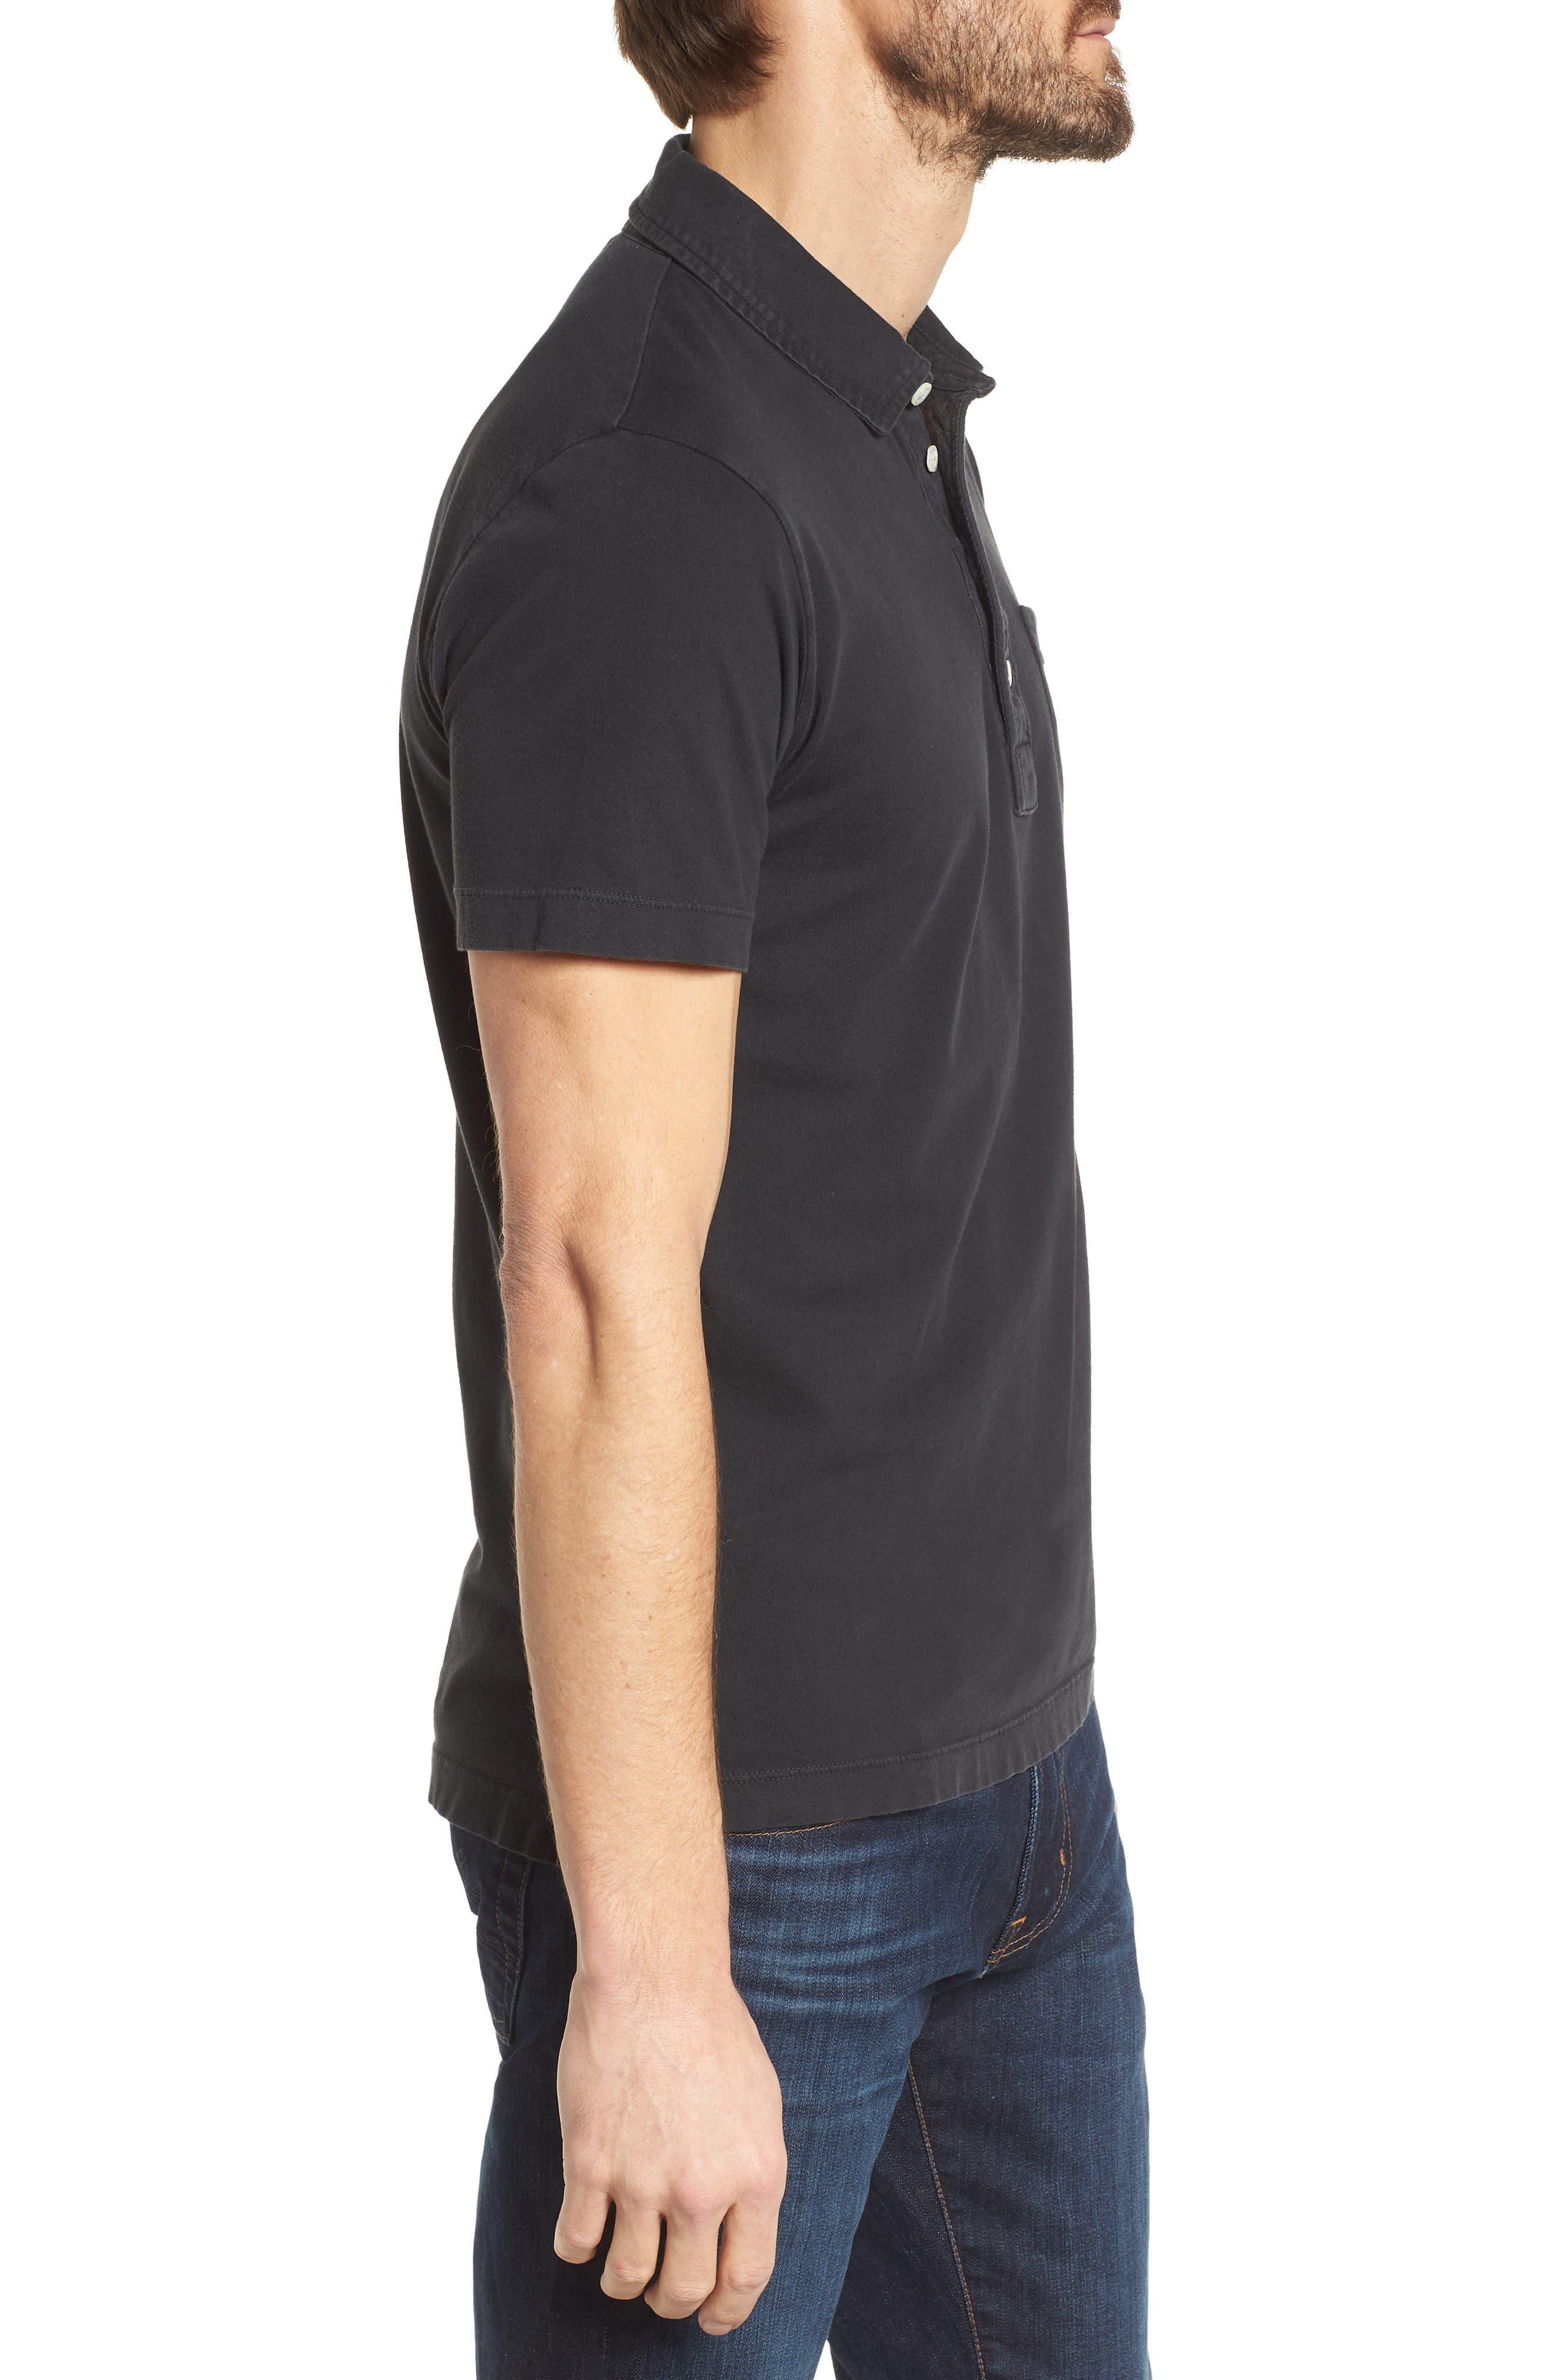 BILLY REID, Pensacola Slim Fit Garment Dye Polo, Alternate thumbnail 3, color, BLACK